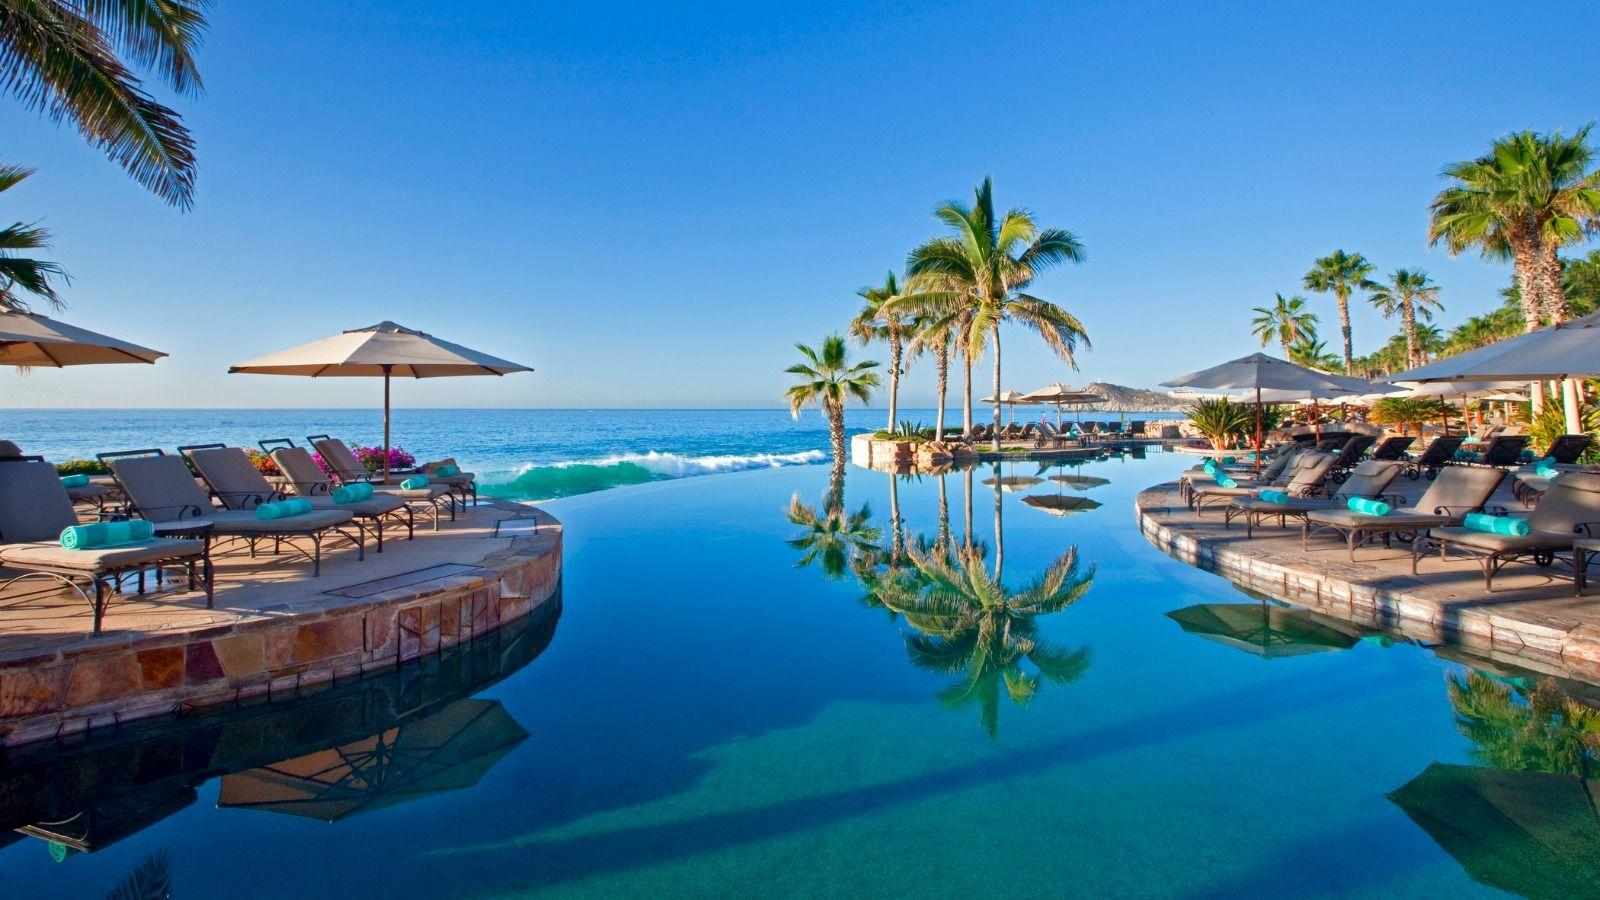 Infinity Pool at the Sheraton Hacienda del Mar Golf & Spa Resort